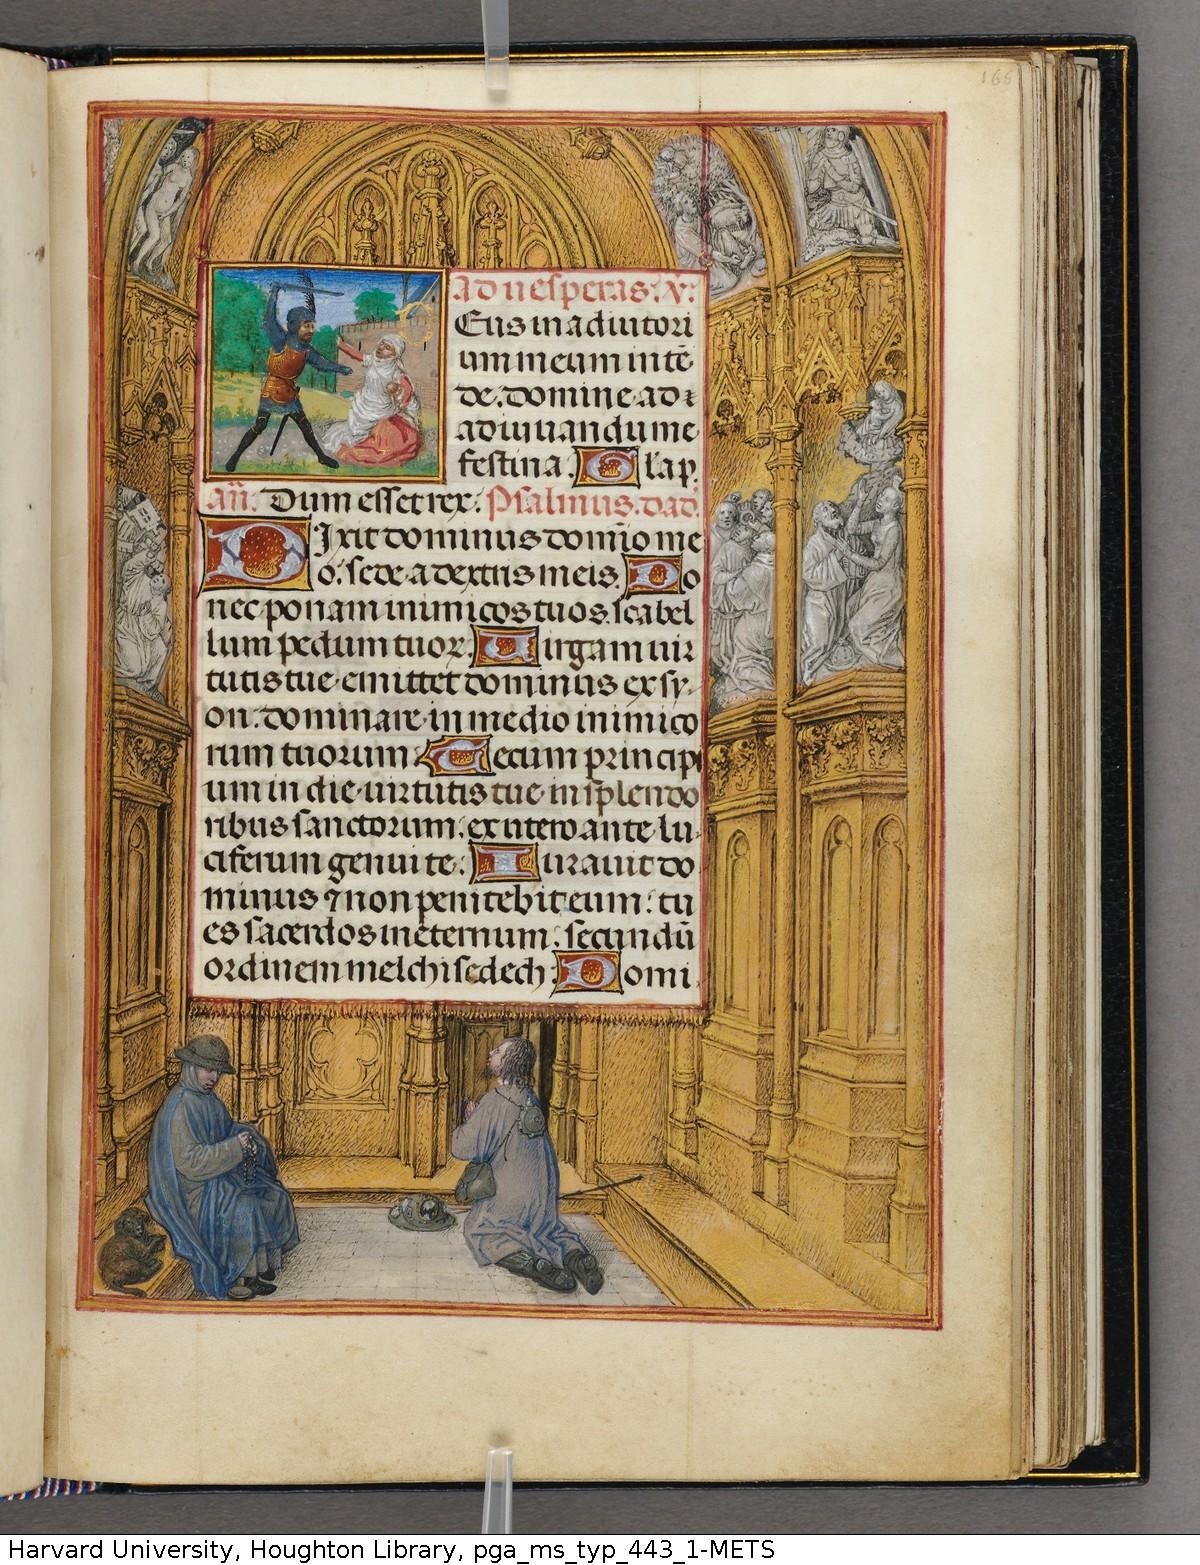 Emerson-White Hours use of Rome 1480 ca Harvard University, Houghton Library, MSS Typ 443.1 fol 166 Simon Marmion Houghton Master